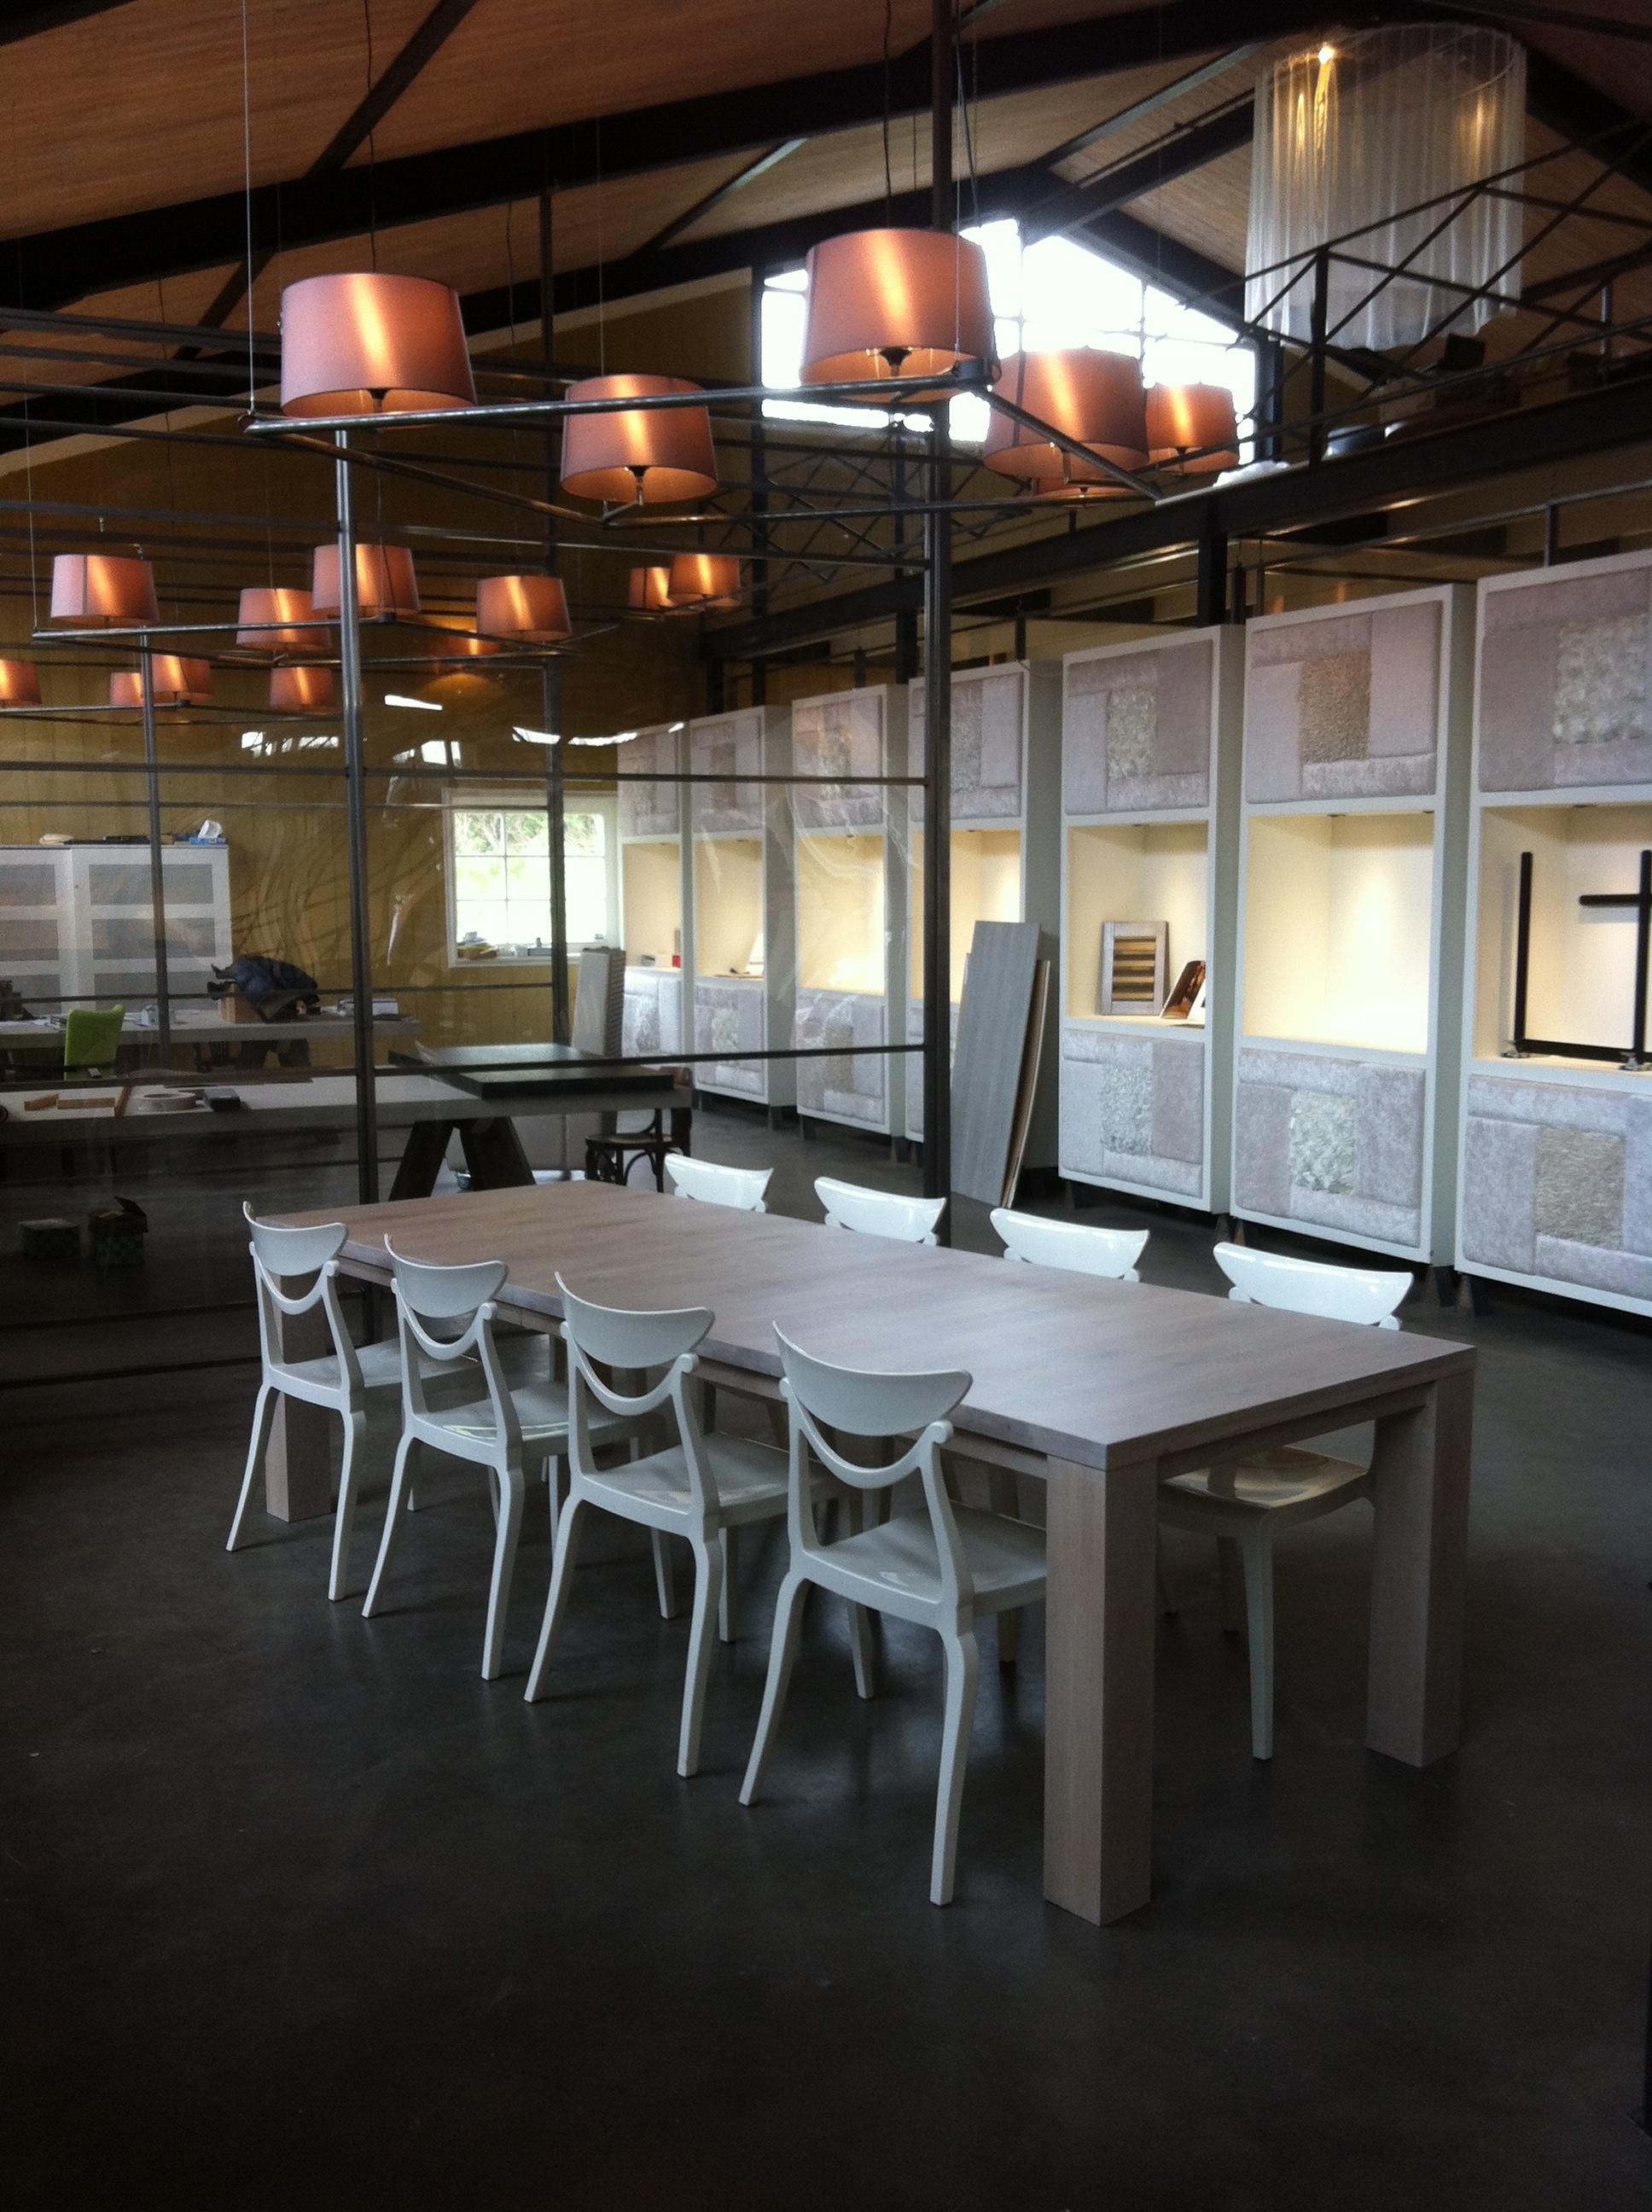 Uitschuifbare tafel 'STRETCH' - DE-EIKEN-TAFEL.NL